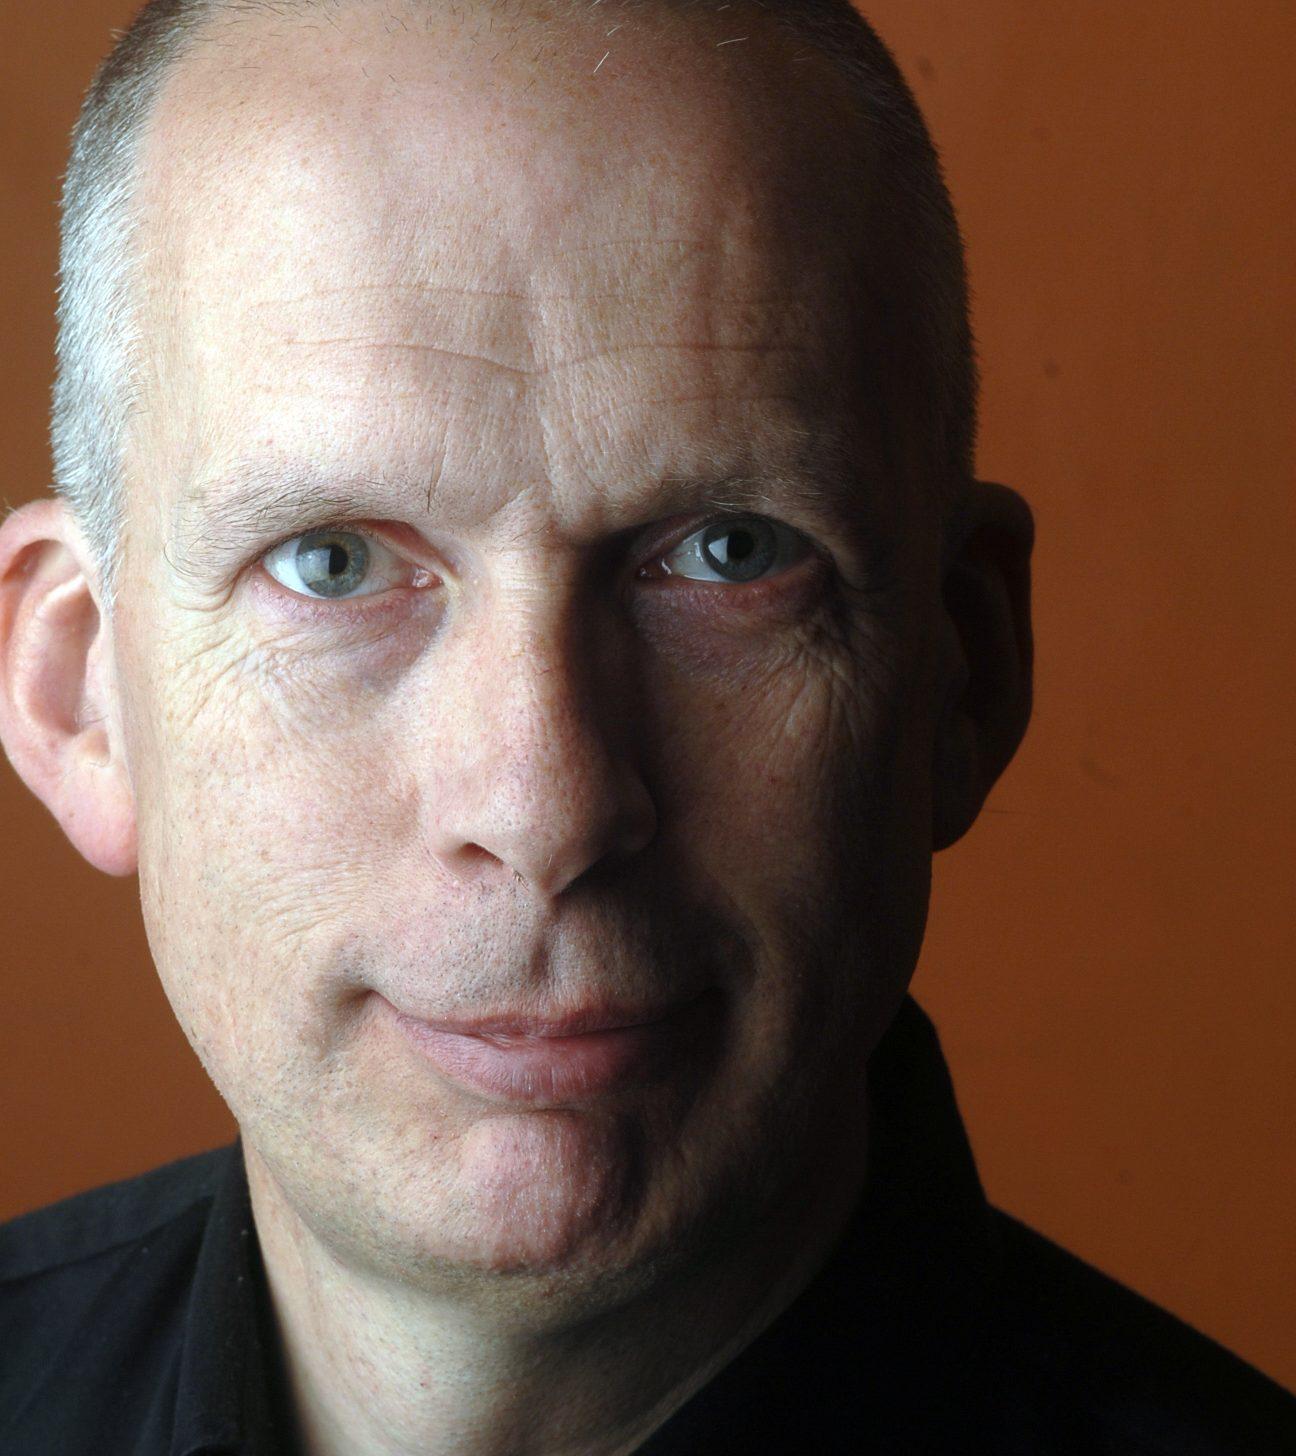 Nicholas Houghton, organist